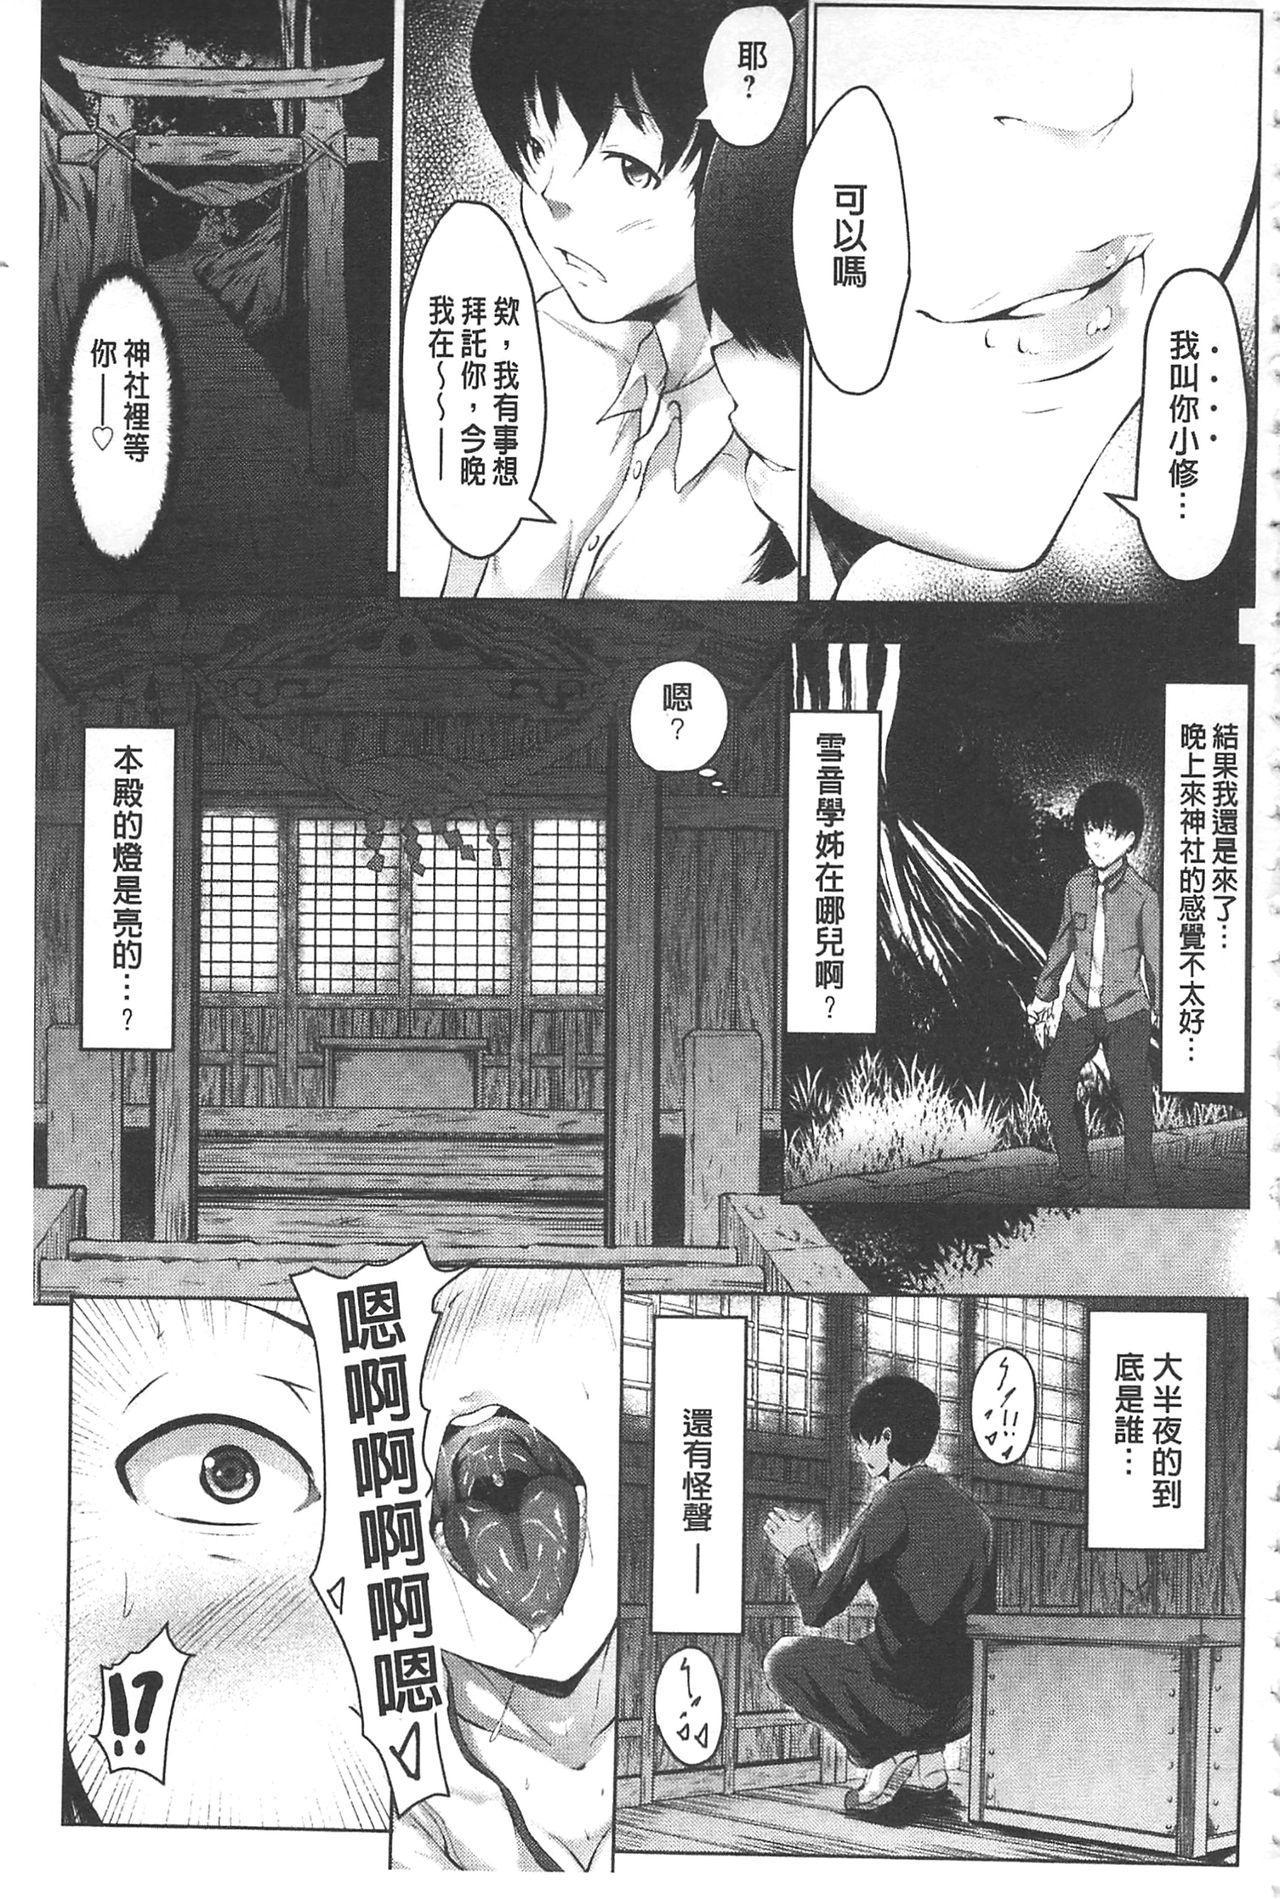 [Lorica] Biinkan Anal ~Kakusei Nejikomi Ana~ | 美淫感猥菊花 塞入擴張覺醒穴 [Chinese] 67